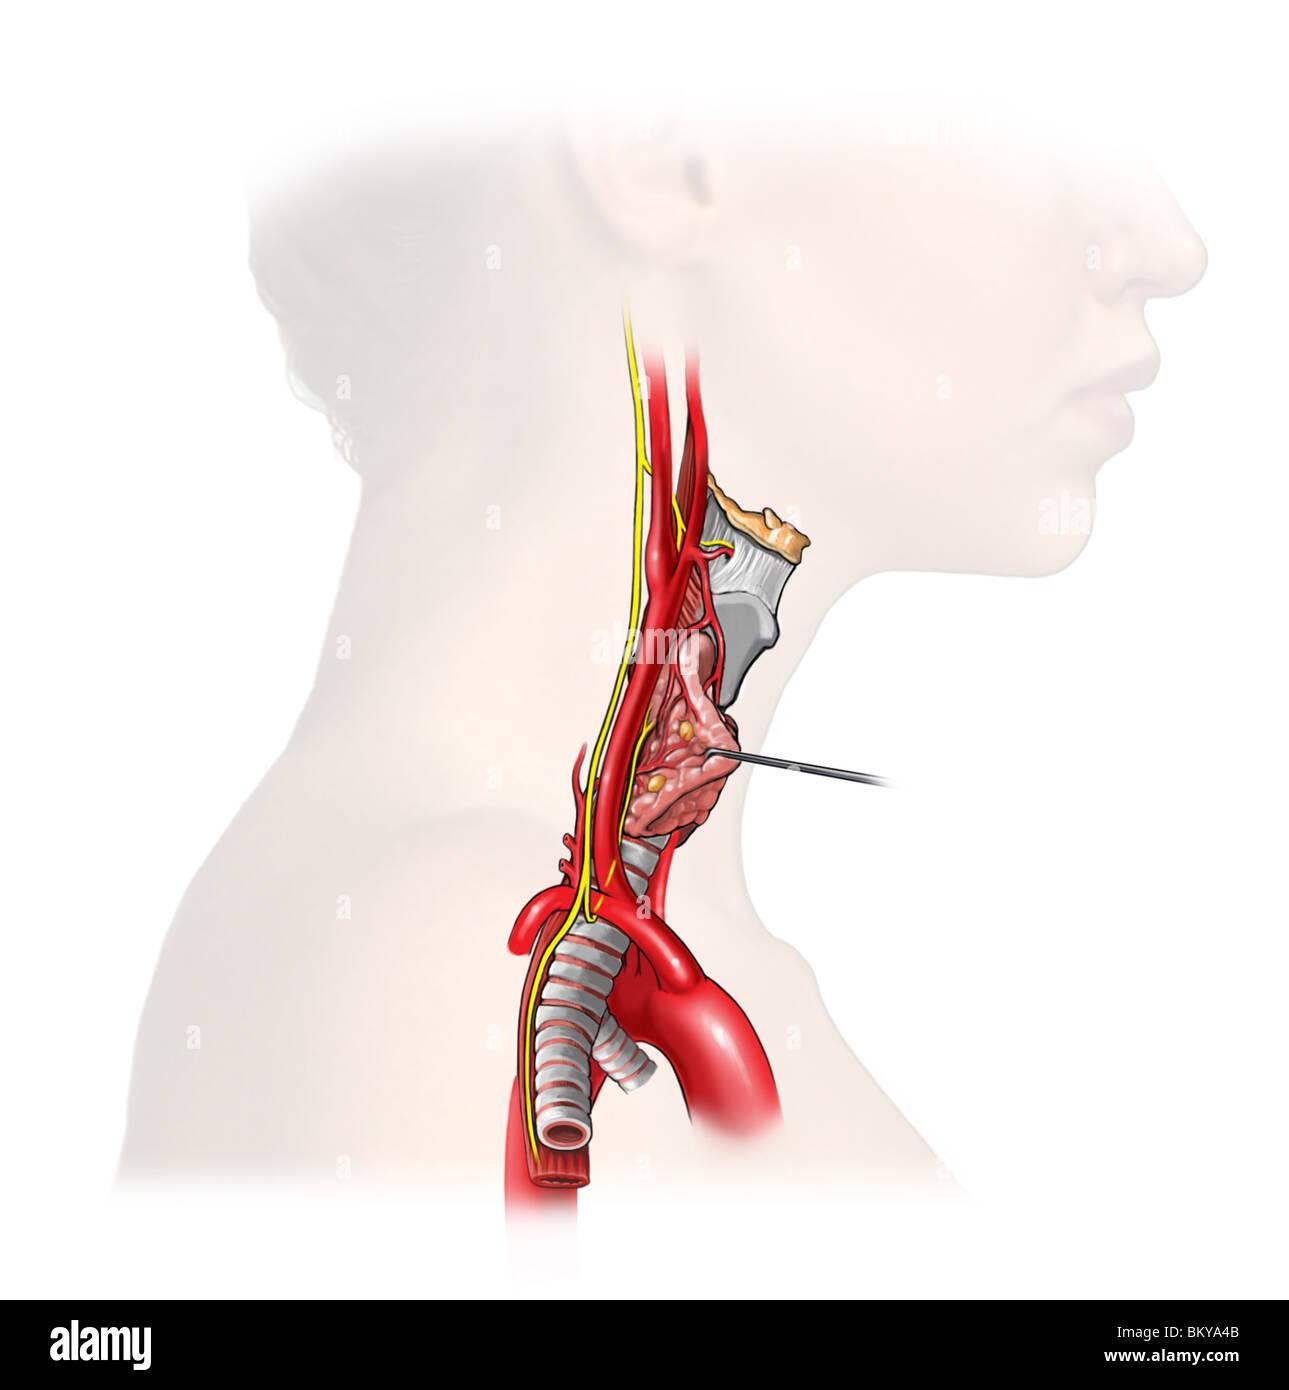 Neck Arteries Stockfotos & Neck Arteries Bilder - Seite 2 - Alamy